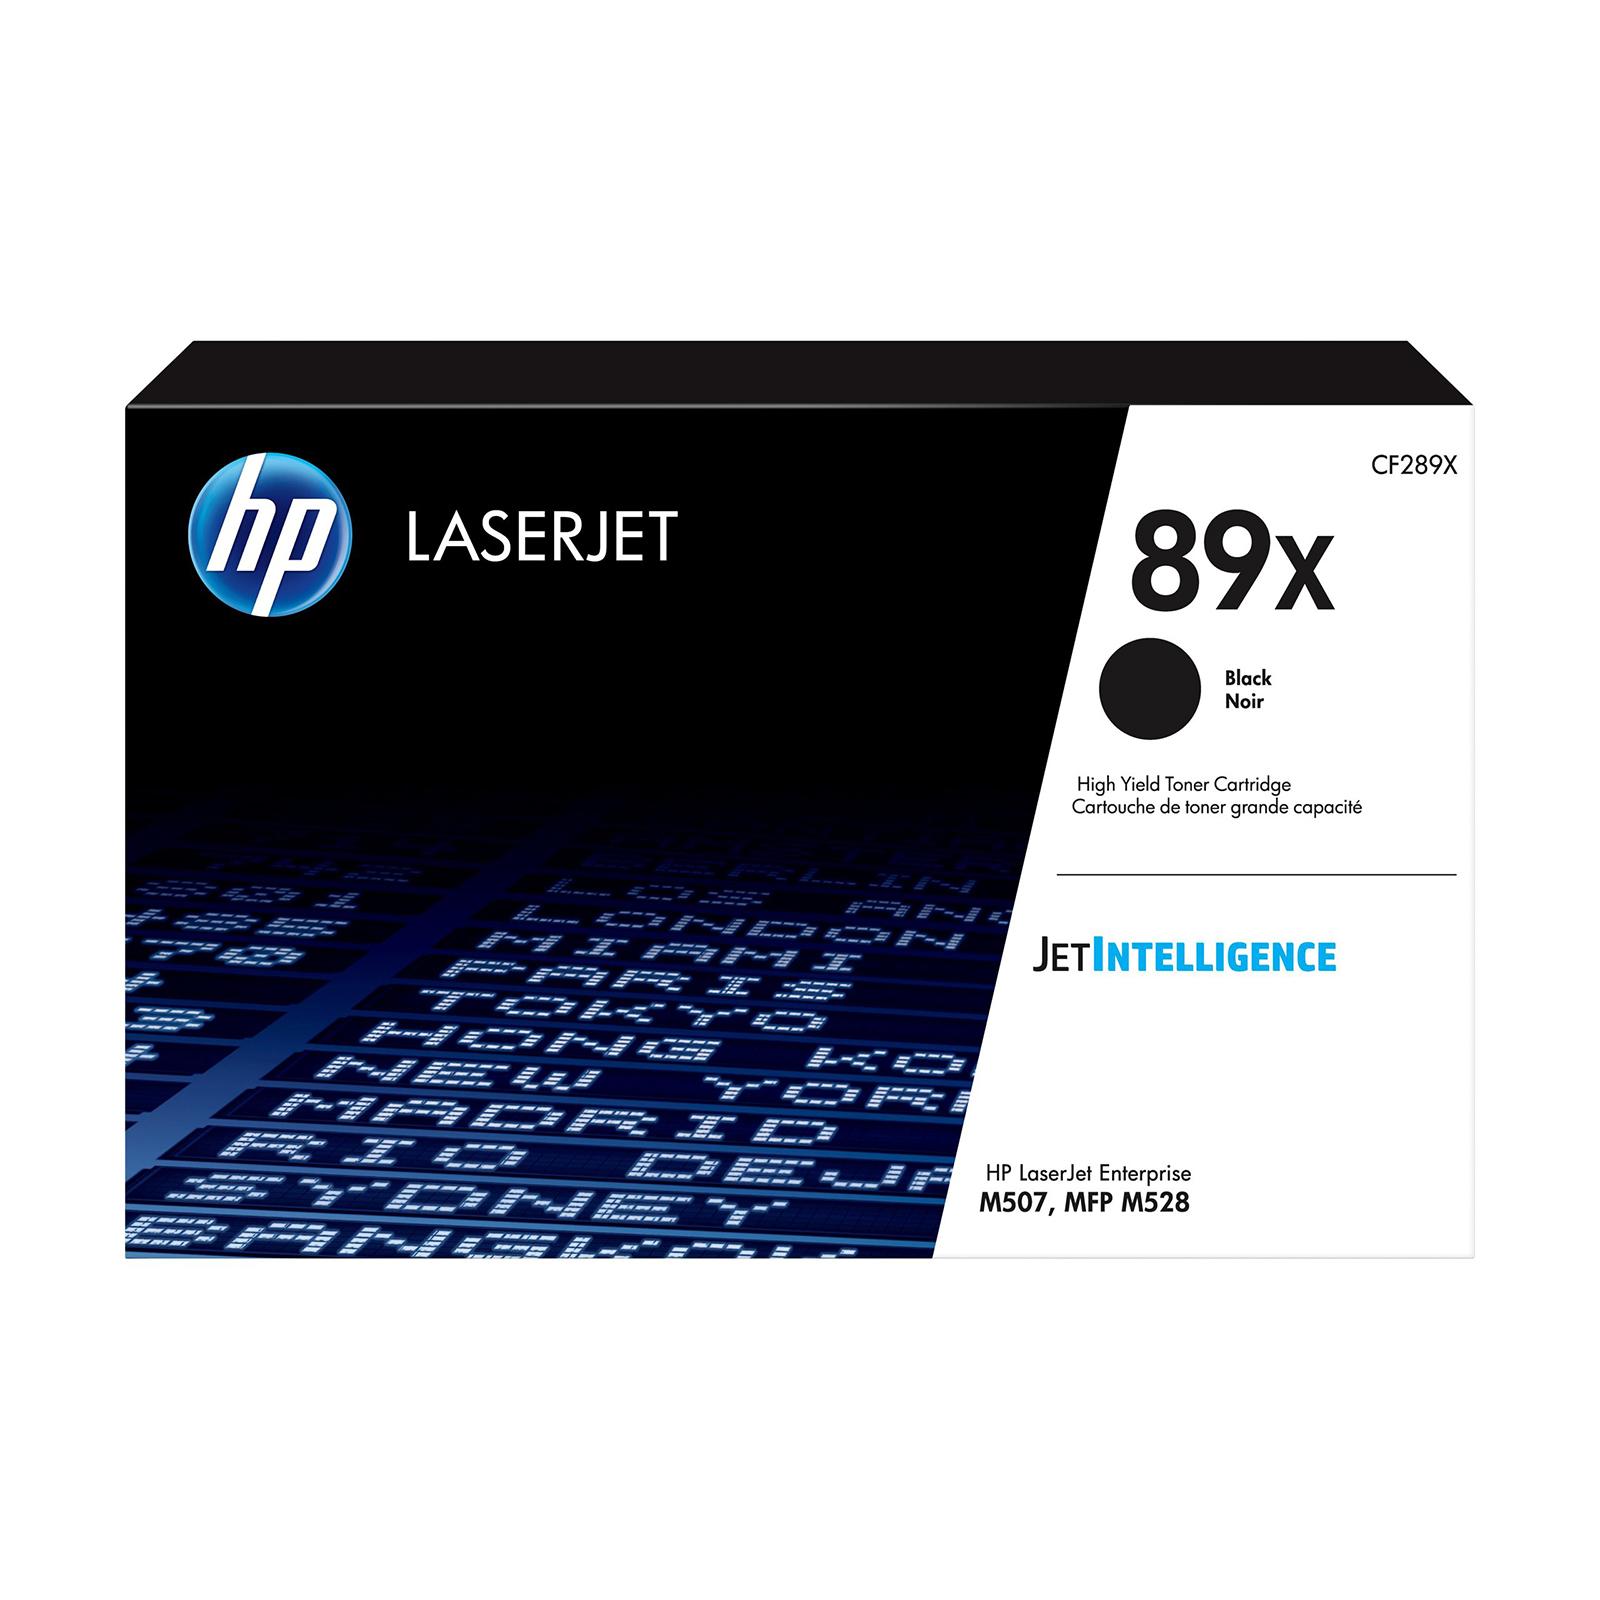 Hewlett Packard 89X Laser Toner Cartridge High Yield Page Life 10,000pp Black Ref CF289X